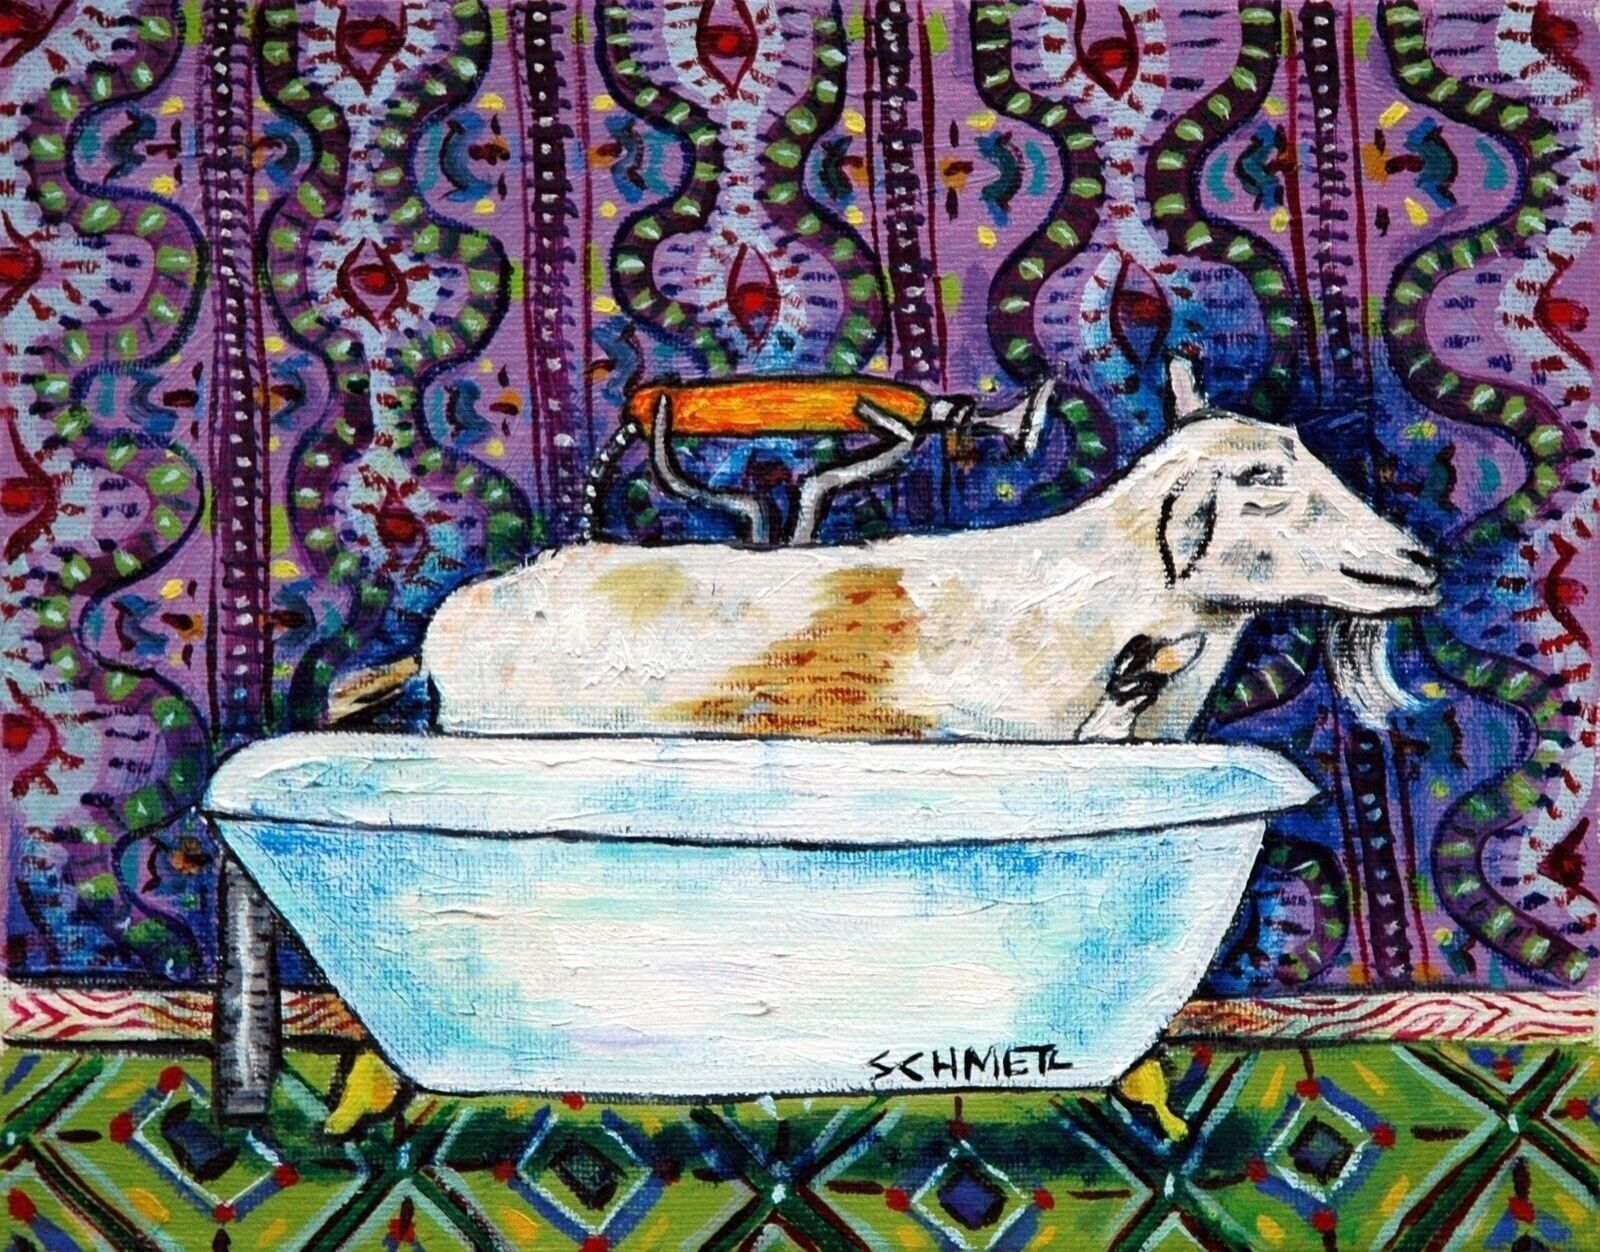 shar pei dog taking a bath  art print 4x6 modern gifts bathroom